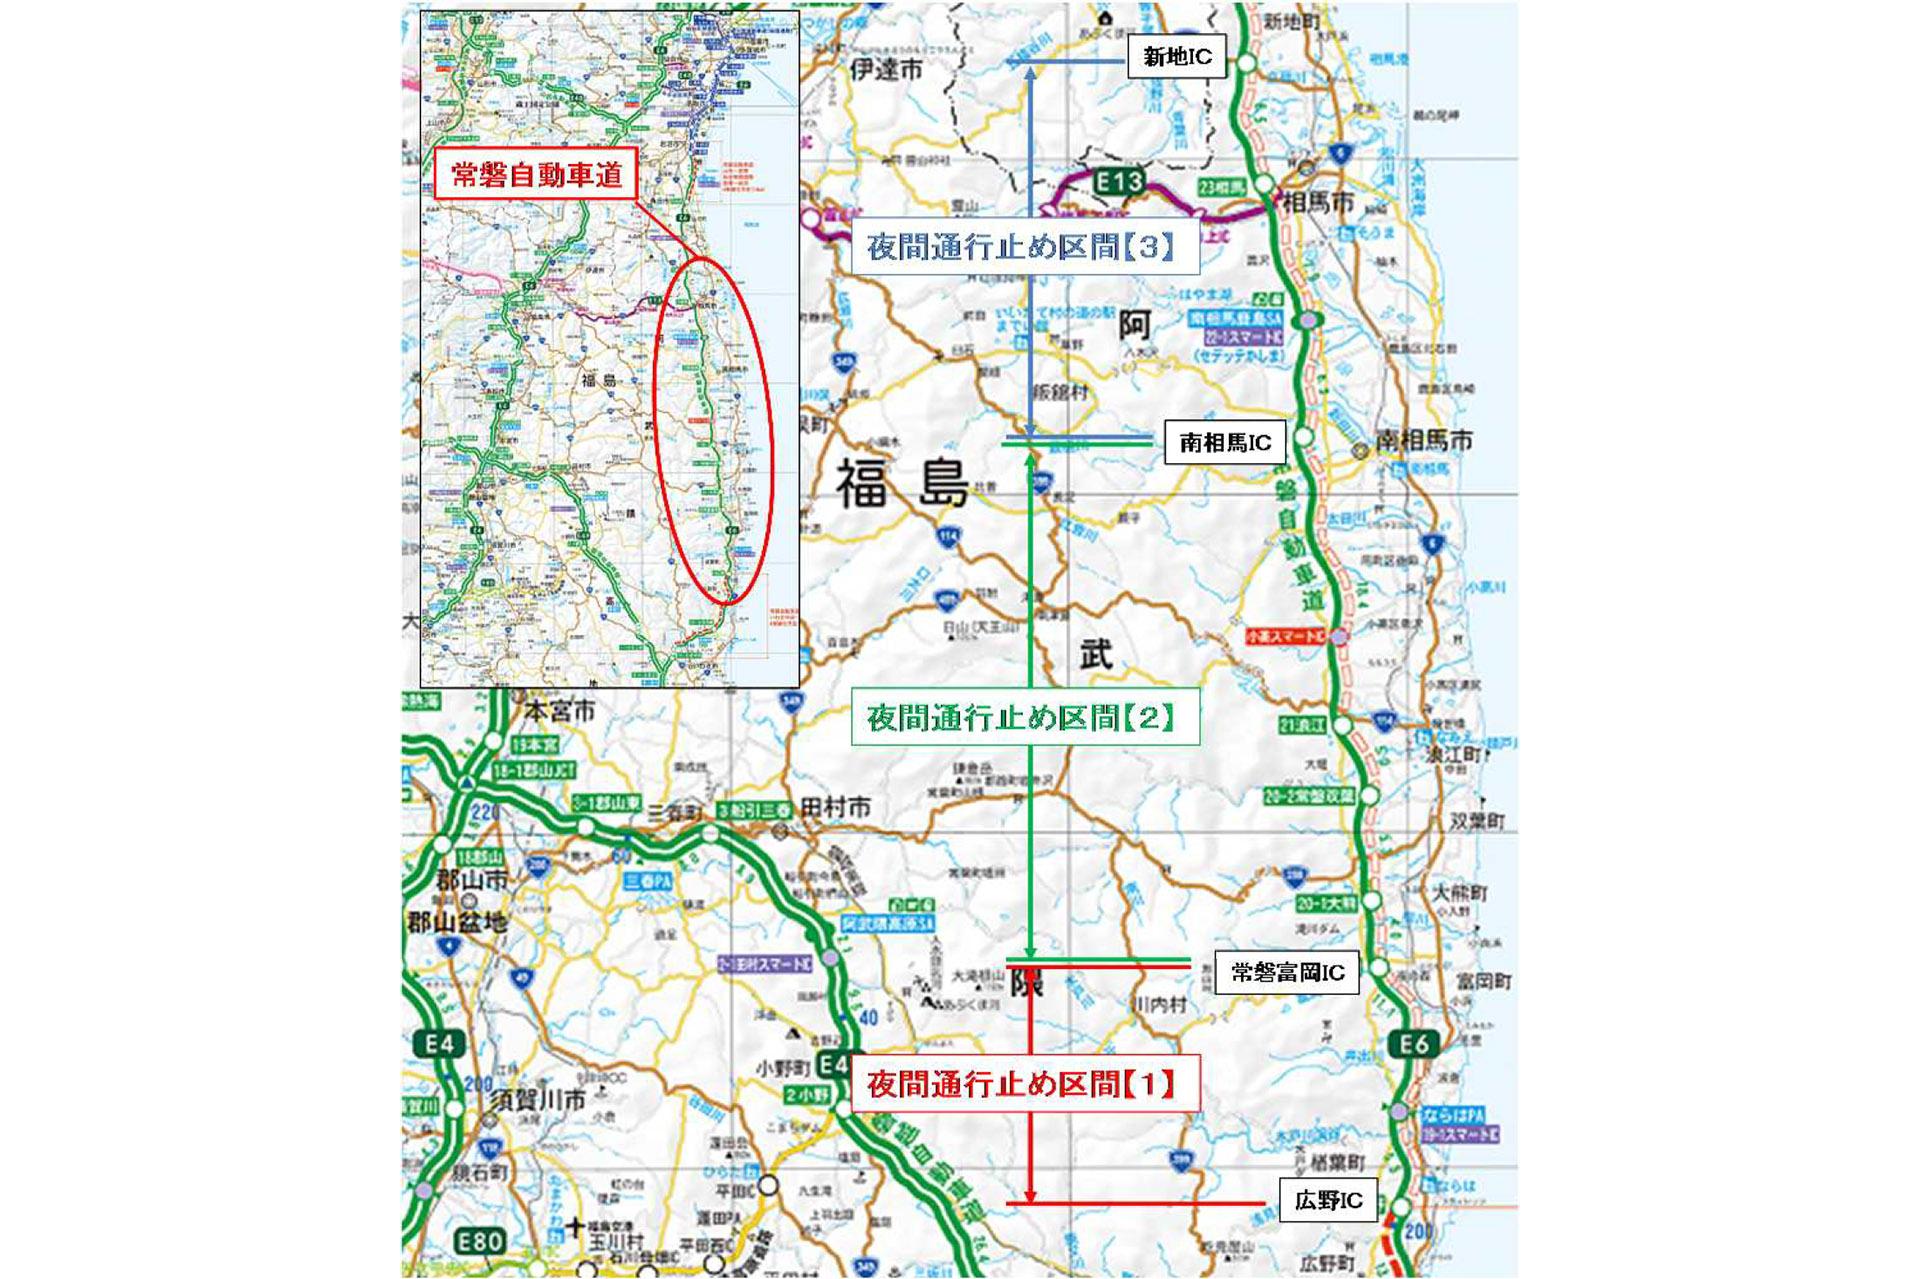 NEXCO東日本は常磐道 広野IC~新地IC間で、付加車線設置工事のため段階的に夜間通行止めを実施する